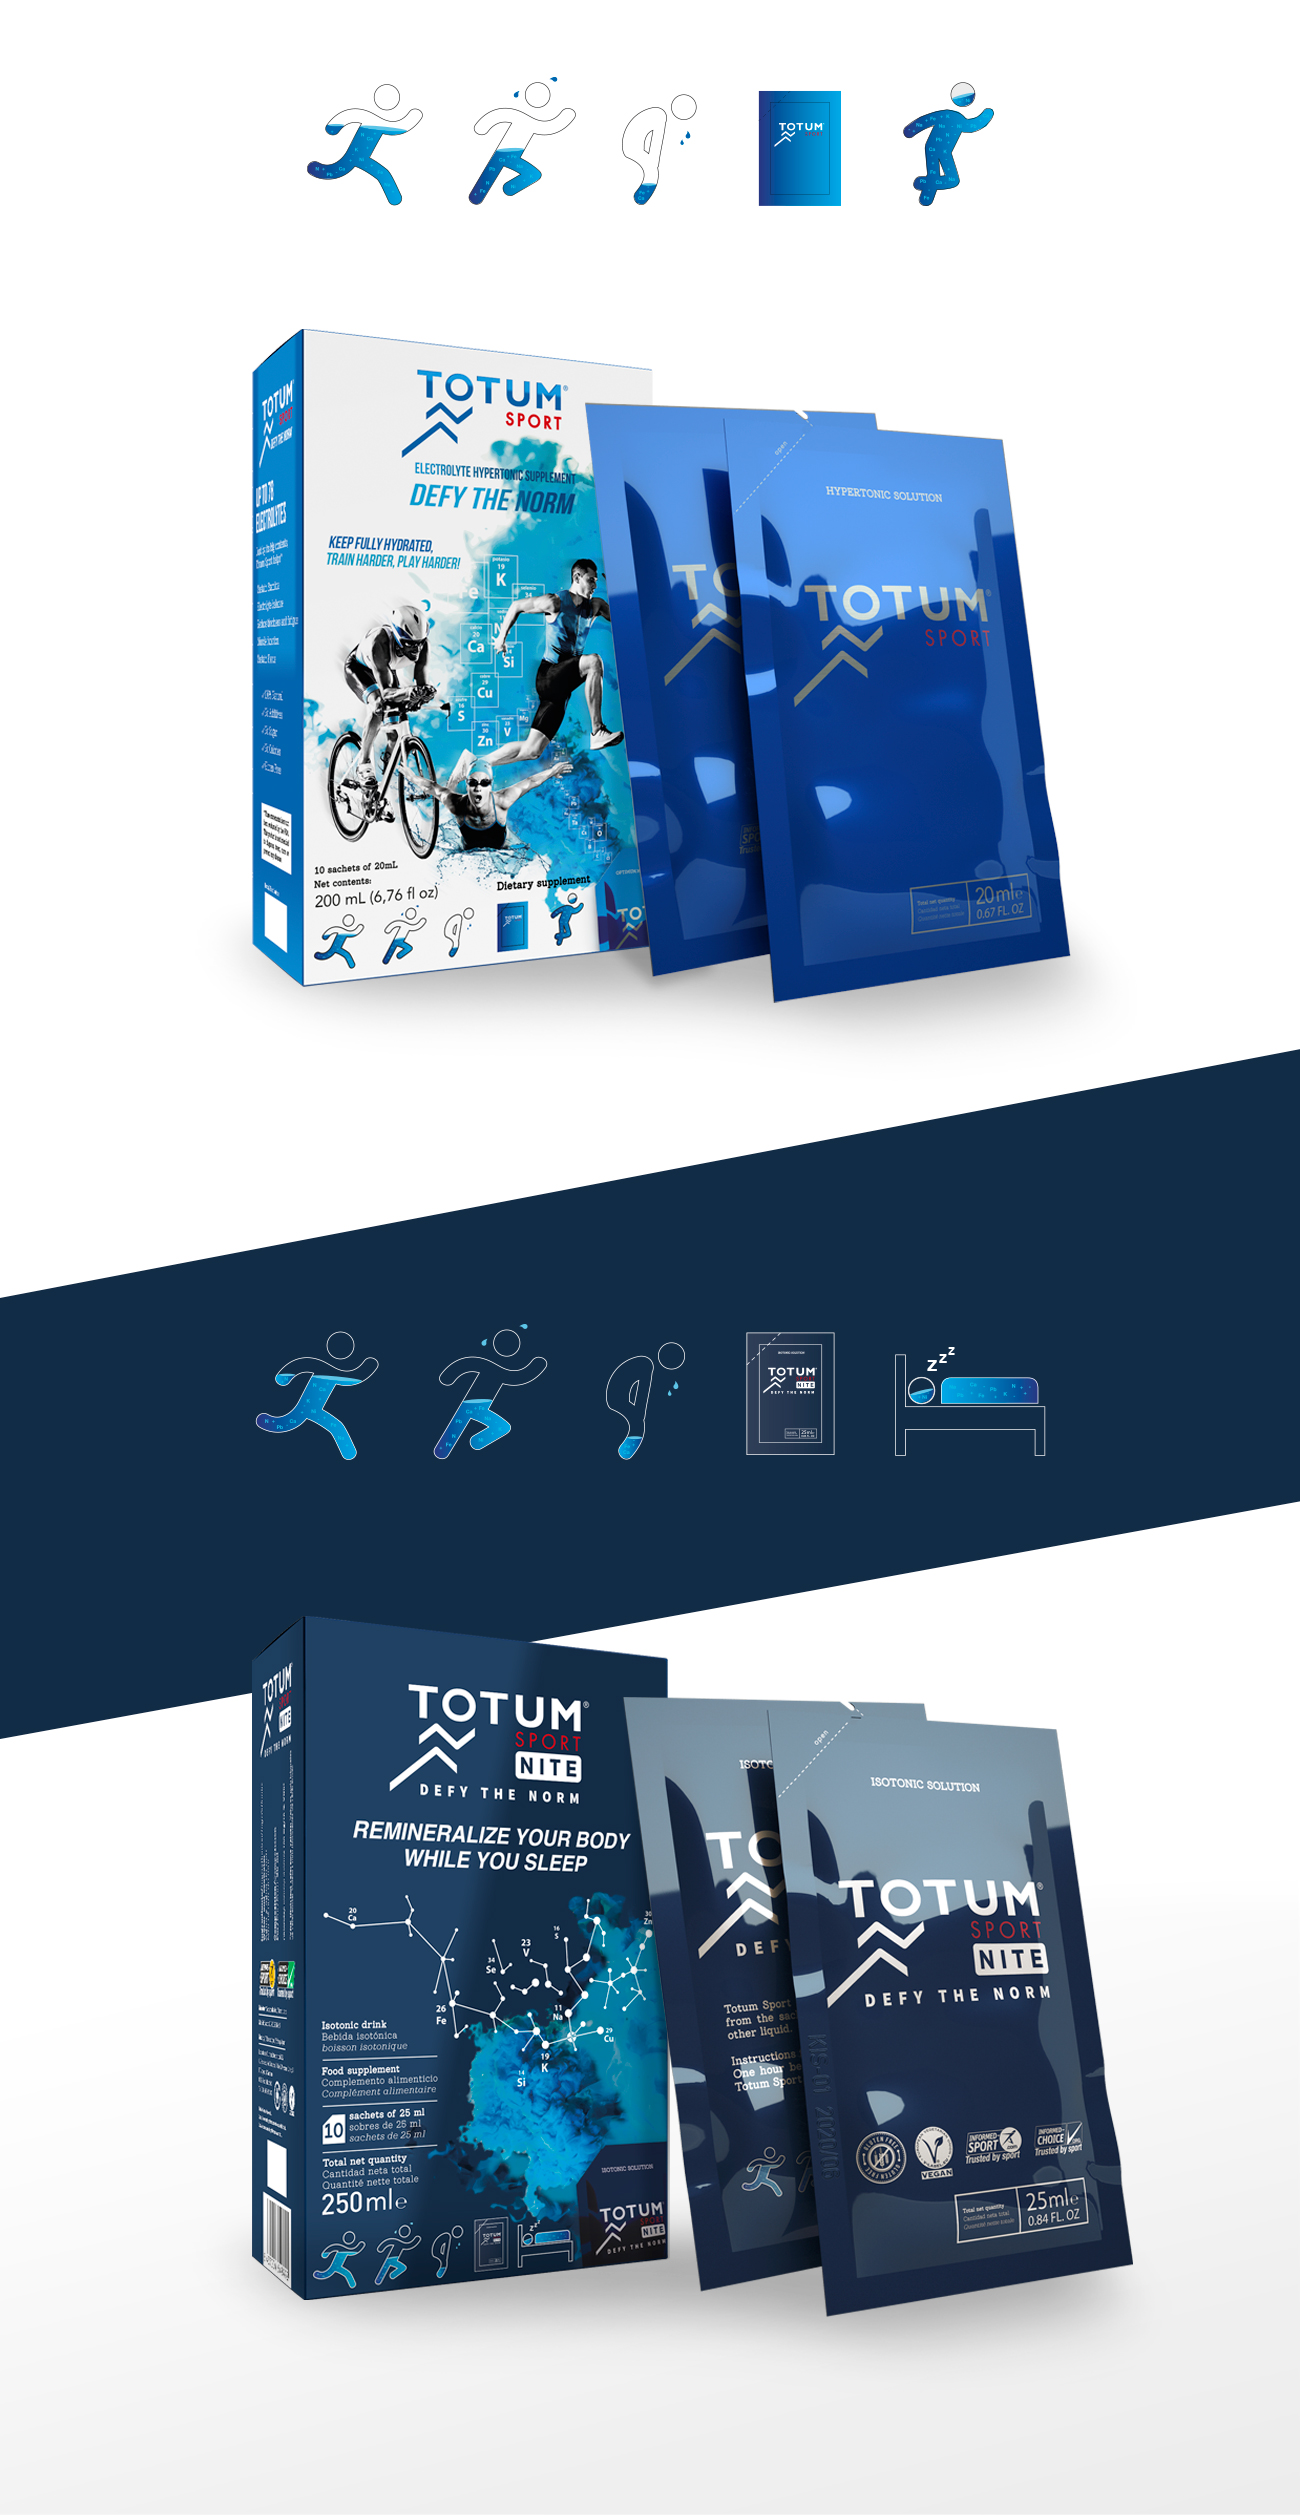 ugedafita-totum-packaging